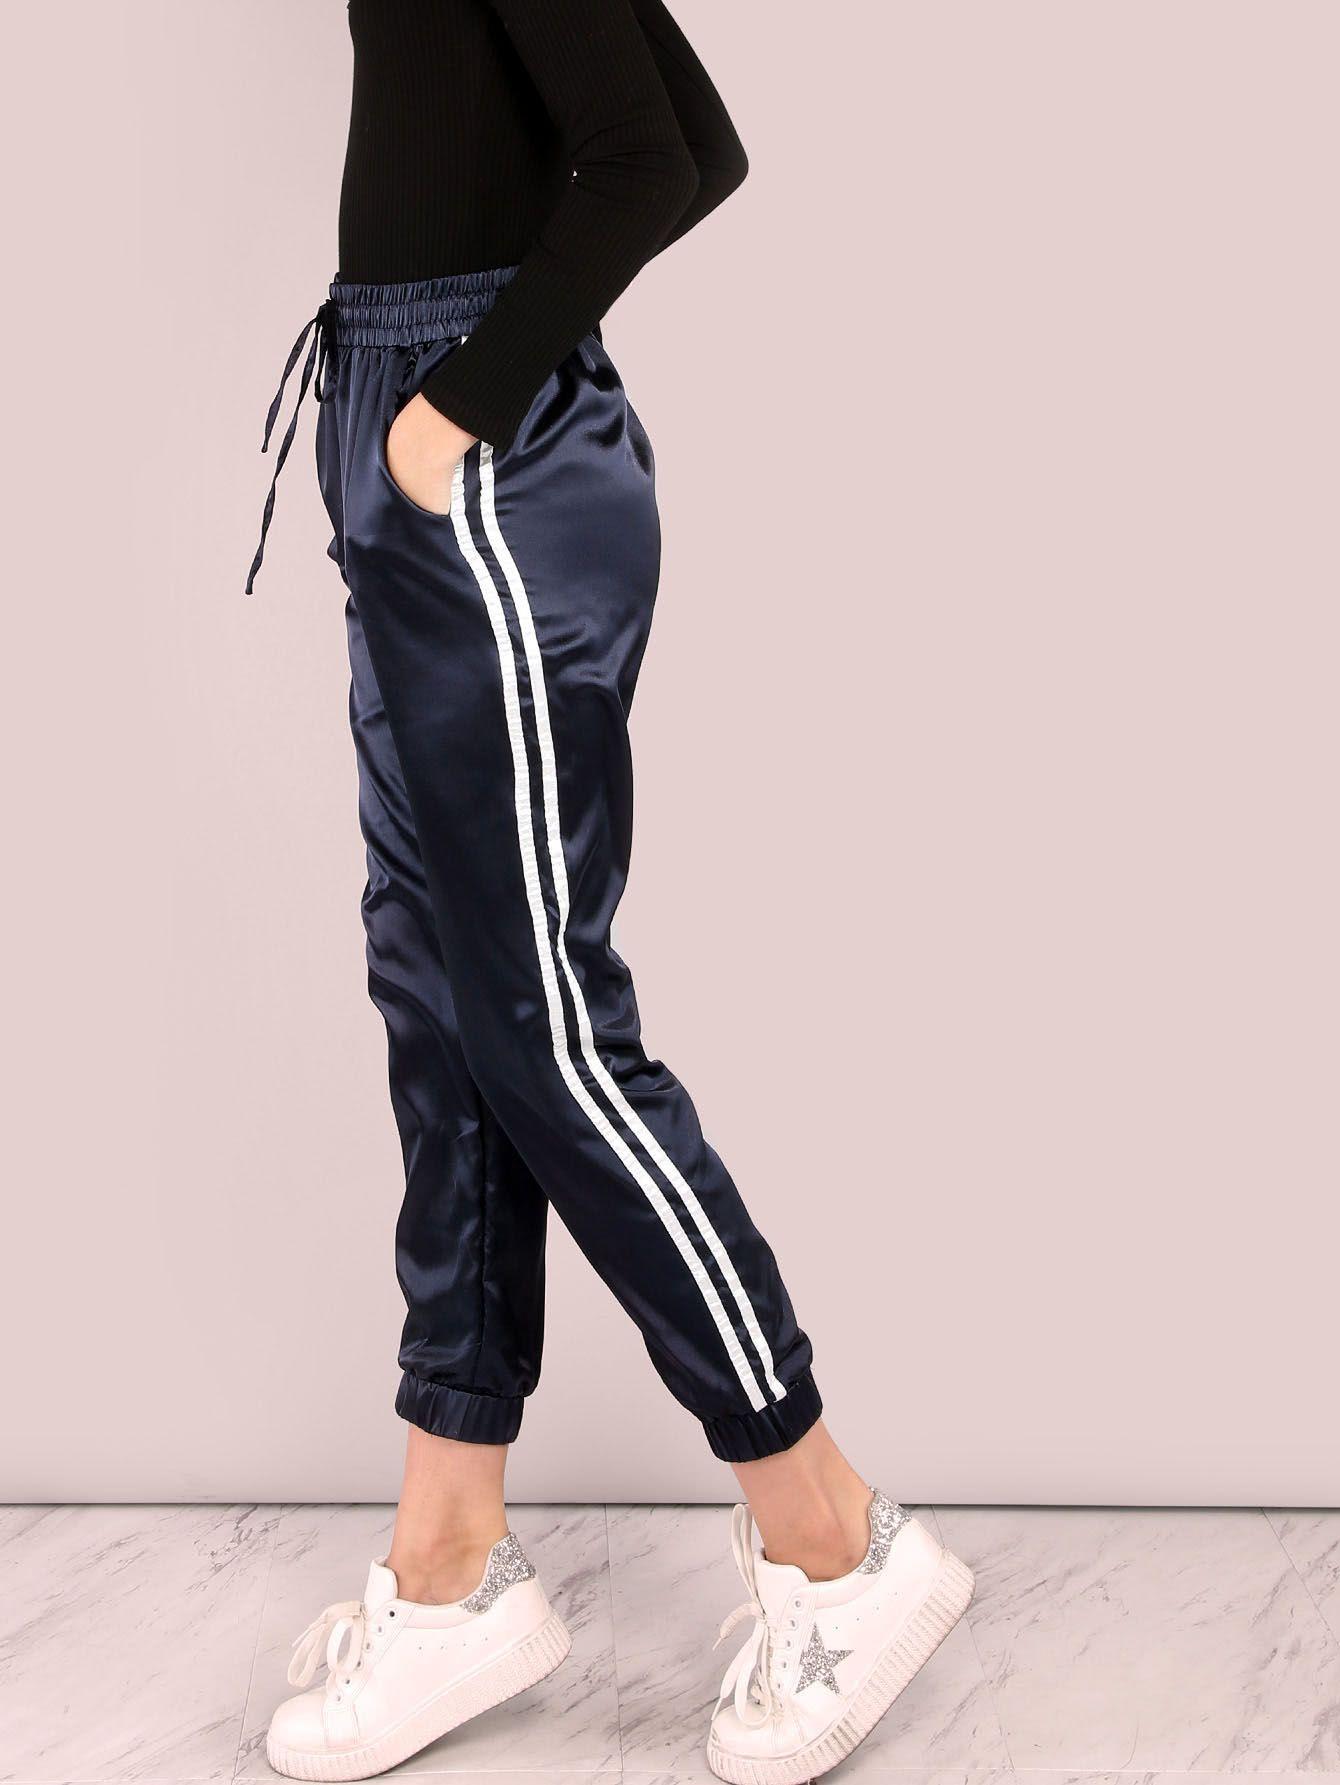 13 Ideas De Pantalones Adidas Mujer Pantalones Adidas Mujer Moda De Ropa Ropa Tumblr